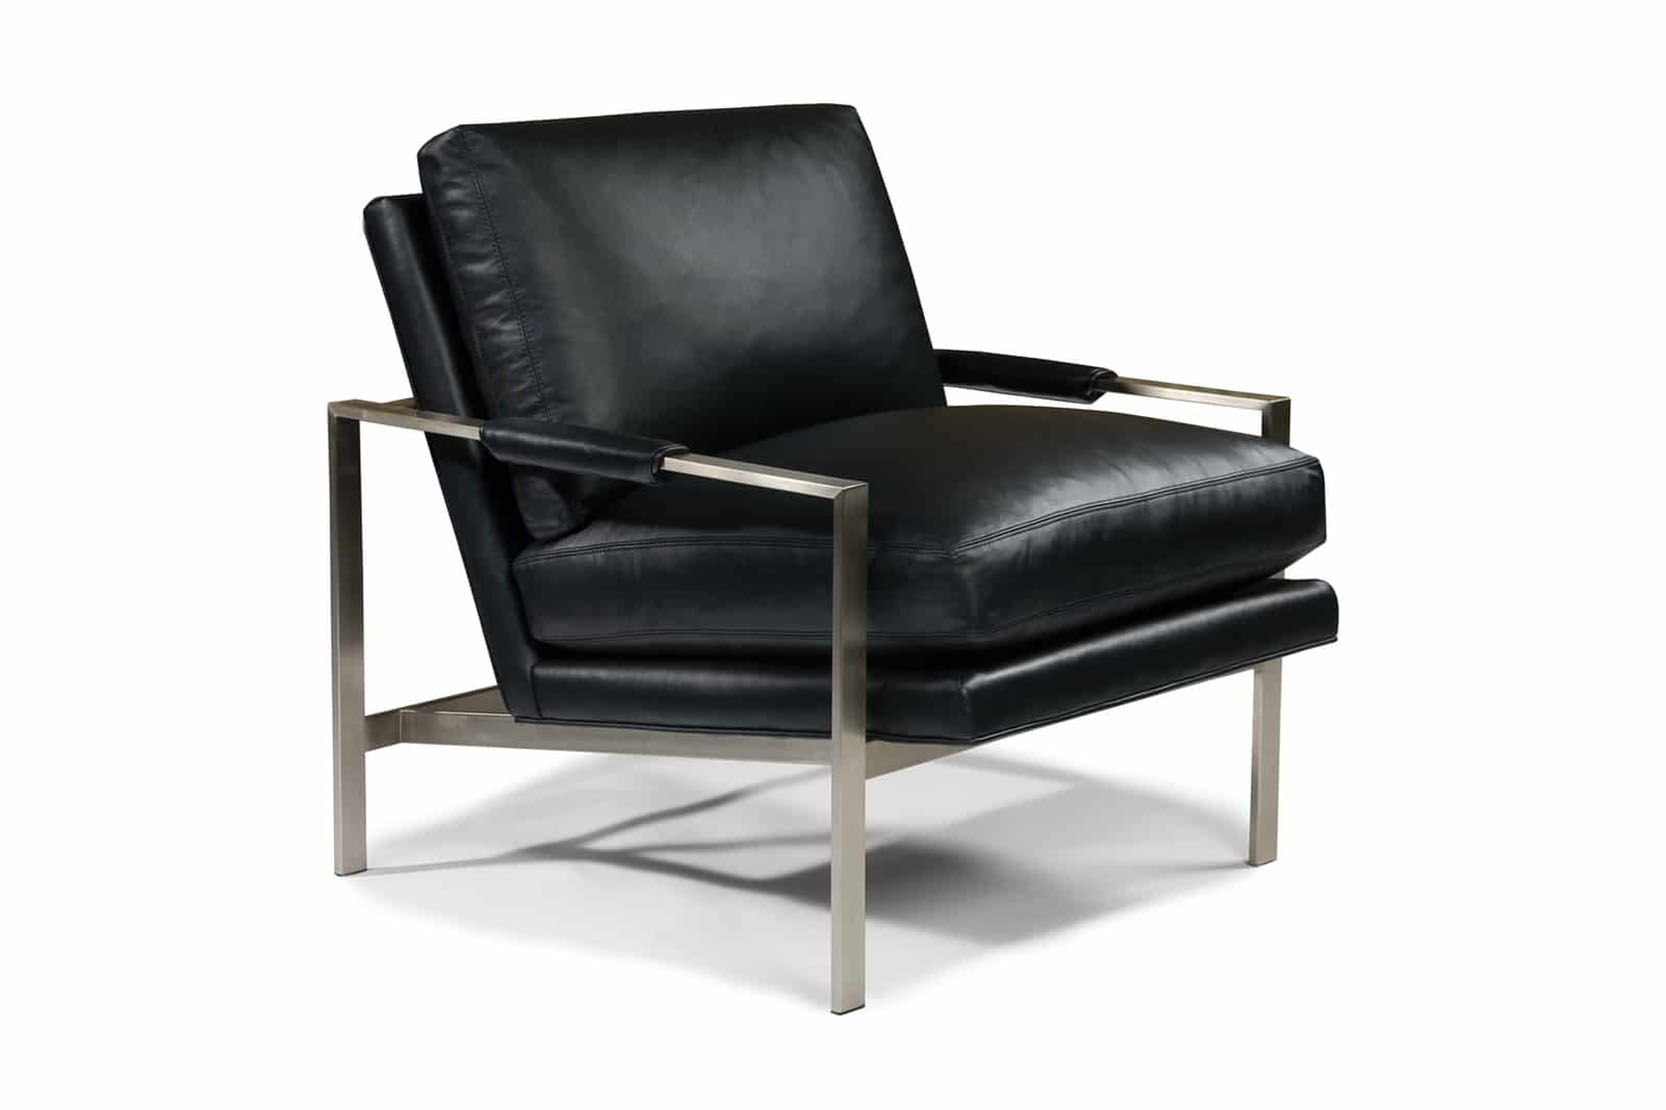 qSs 951 design classic